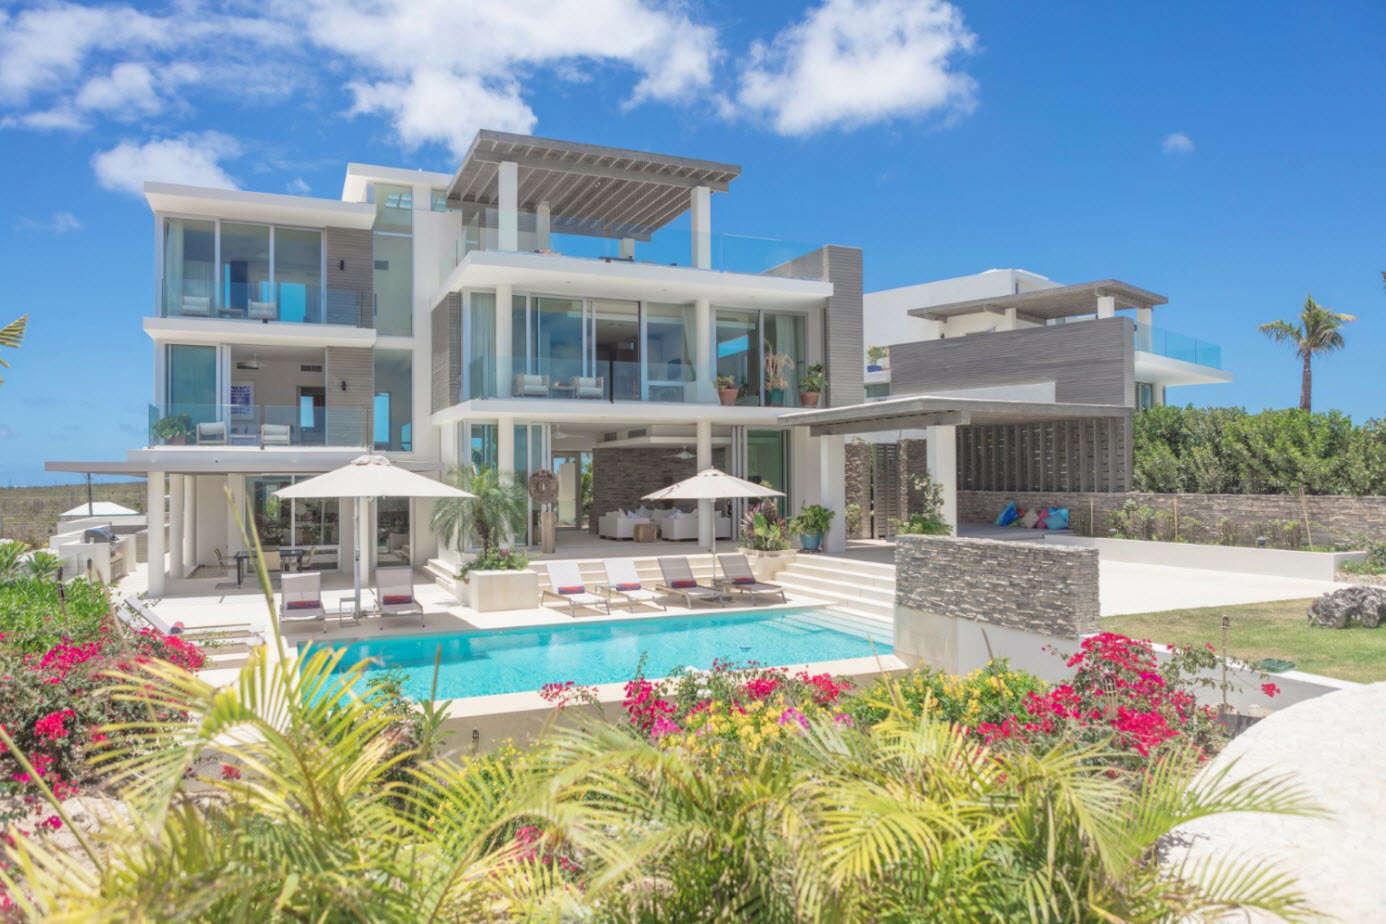 Luxury villa rentals caribbean - Anguilla - Littlebay - North Villa | Ani Anguilla - Image 1/9